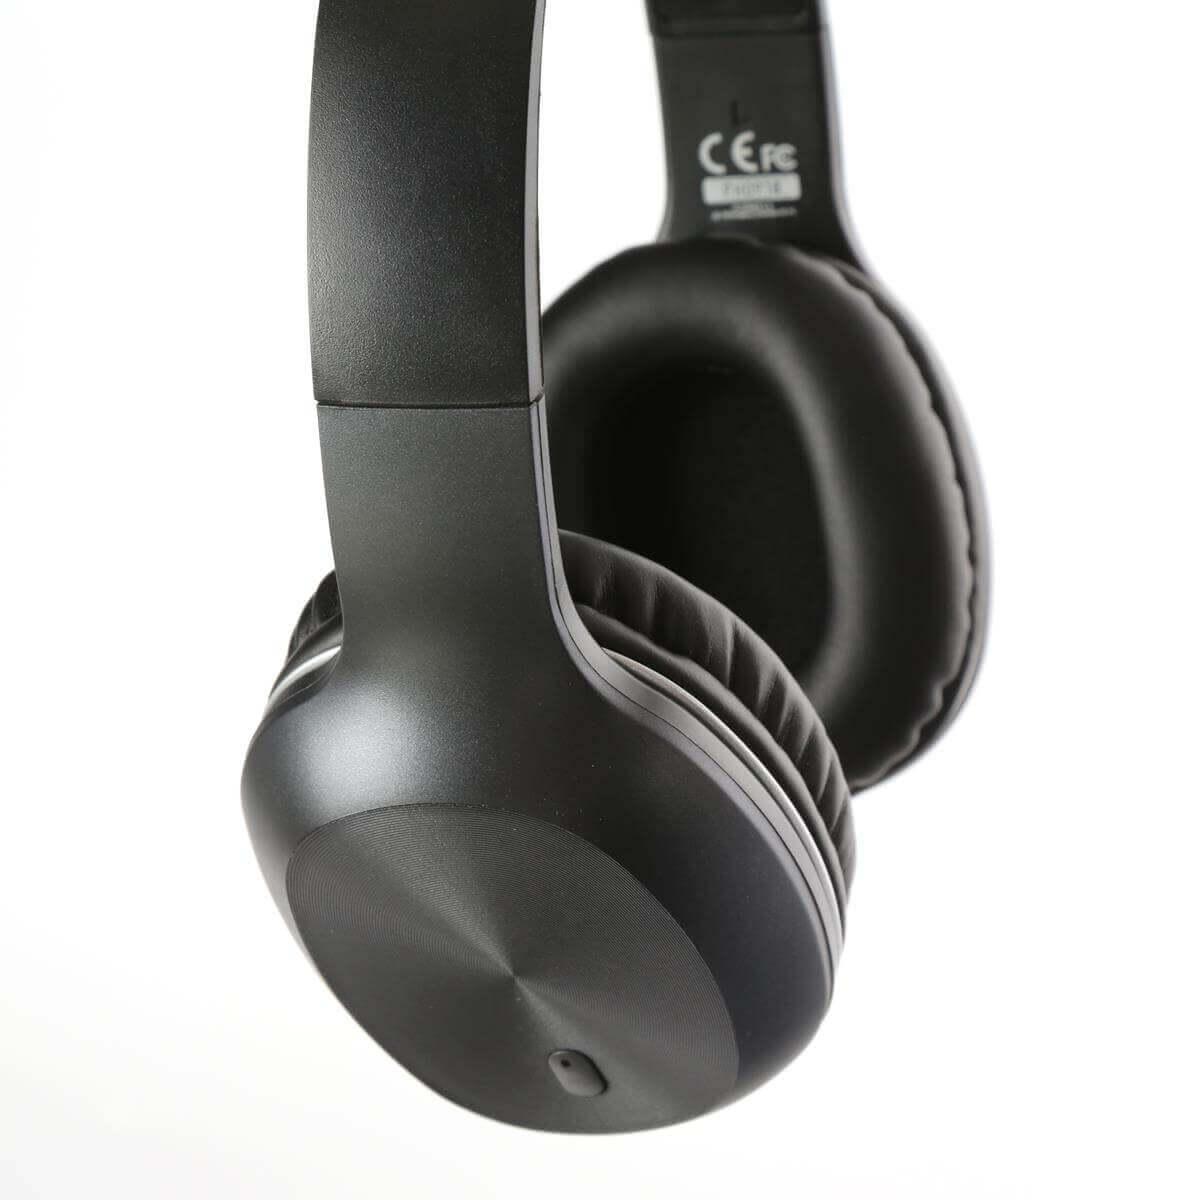 Platinet Freestyle Headset Bluetooth FH0918 — безжични блутут слушалки за мобилни устройства (черен) - 2